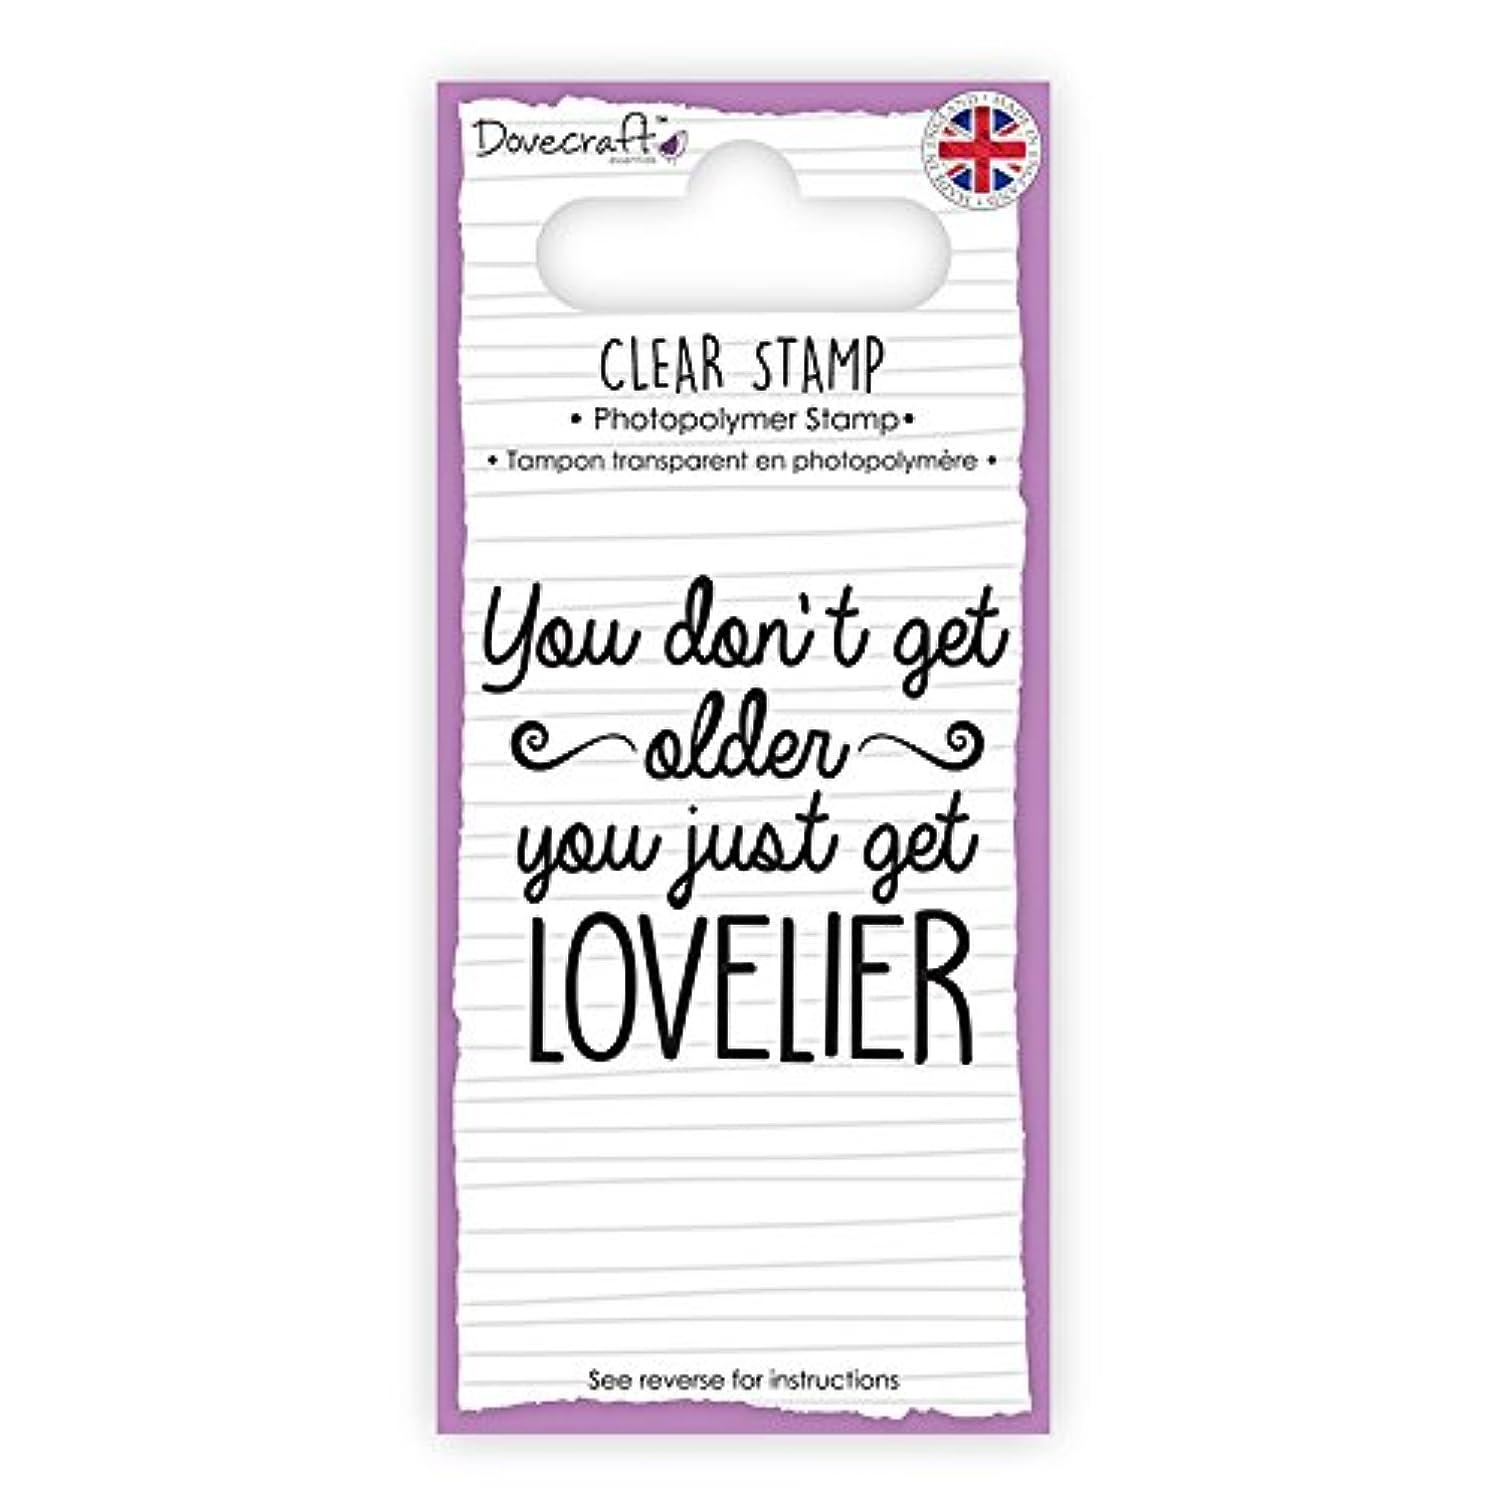 DCSTP093 Dovecraft Sentiment Clear Stamp-Lovelier